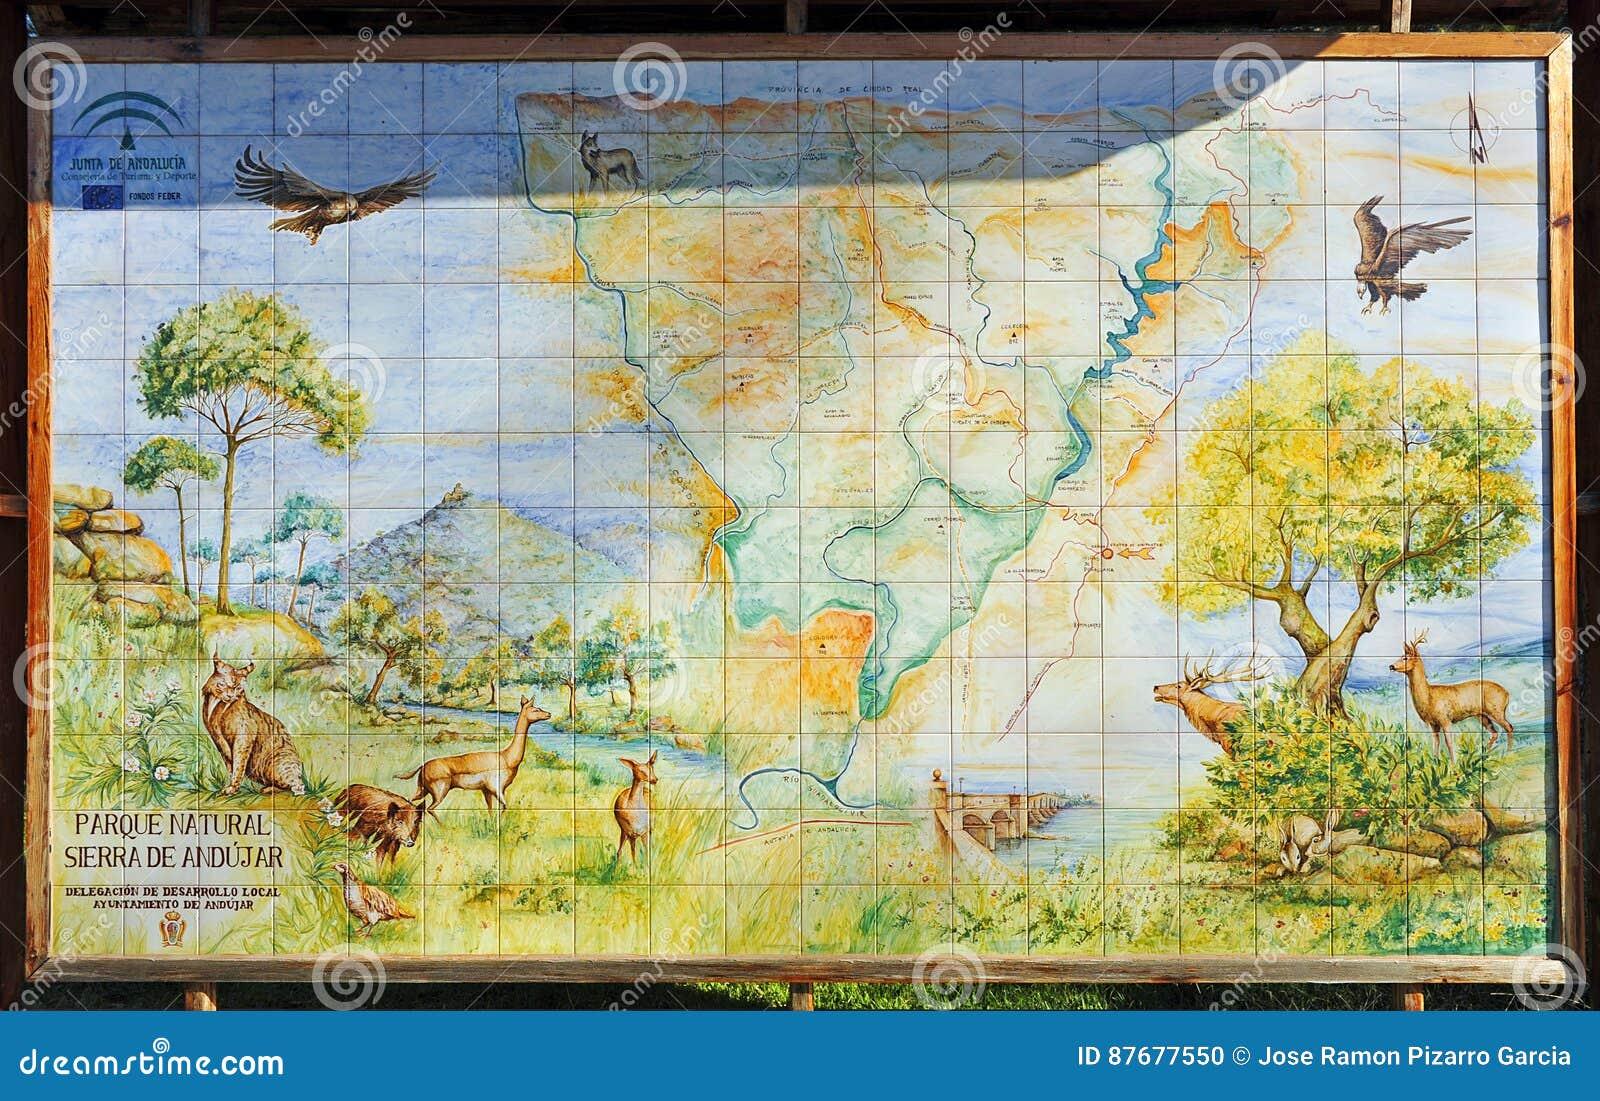 Map Of Spain Jaen.The Sierra De Andujar Natural Park Jaen Province Spain Editorial